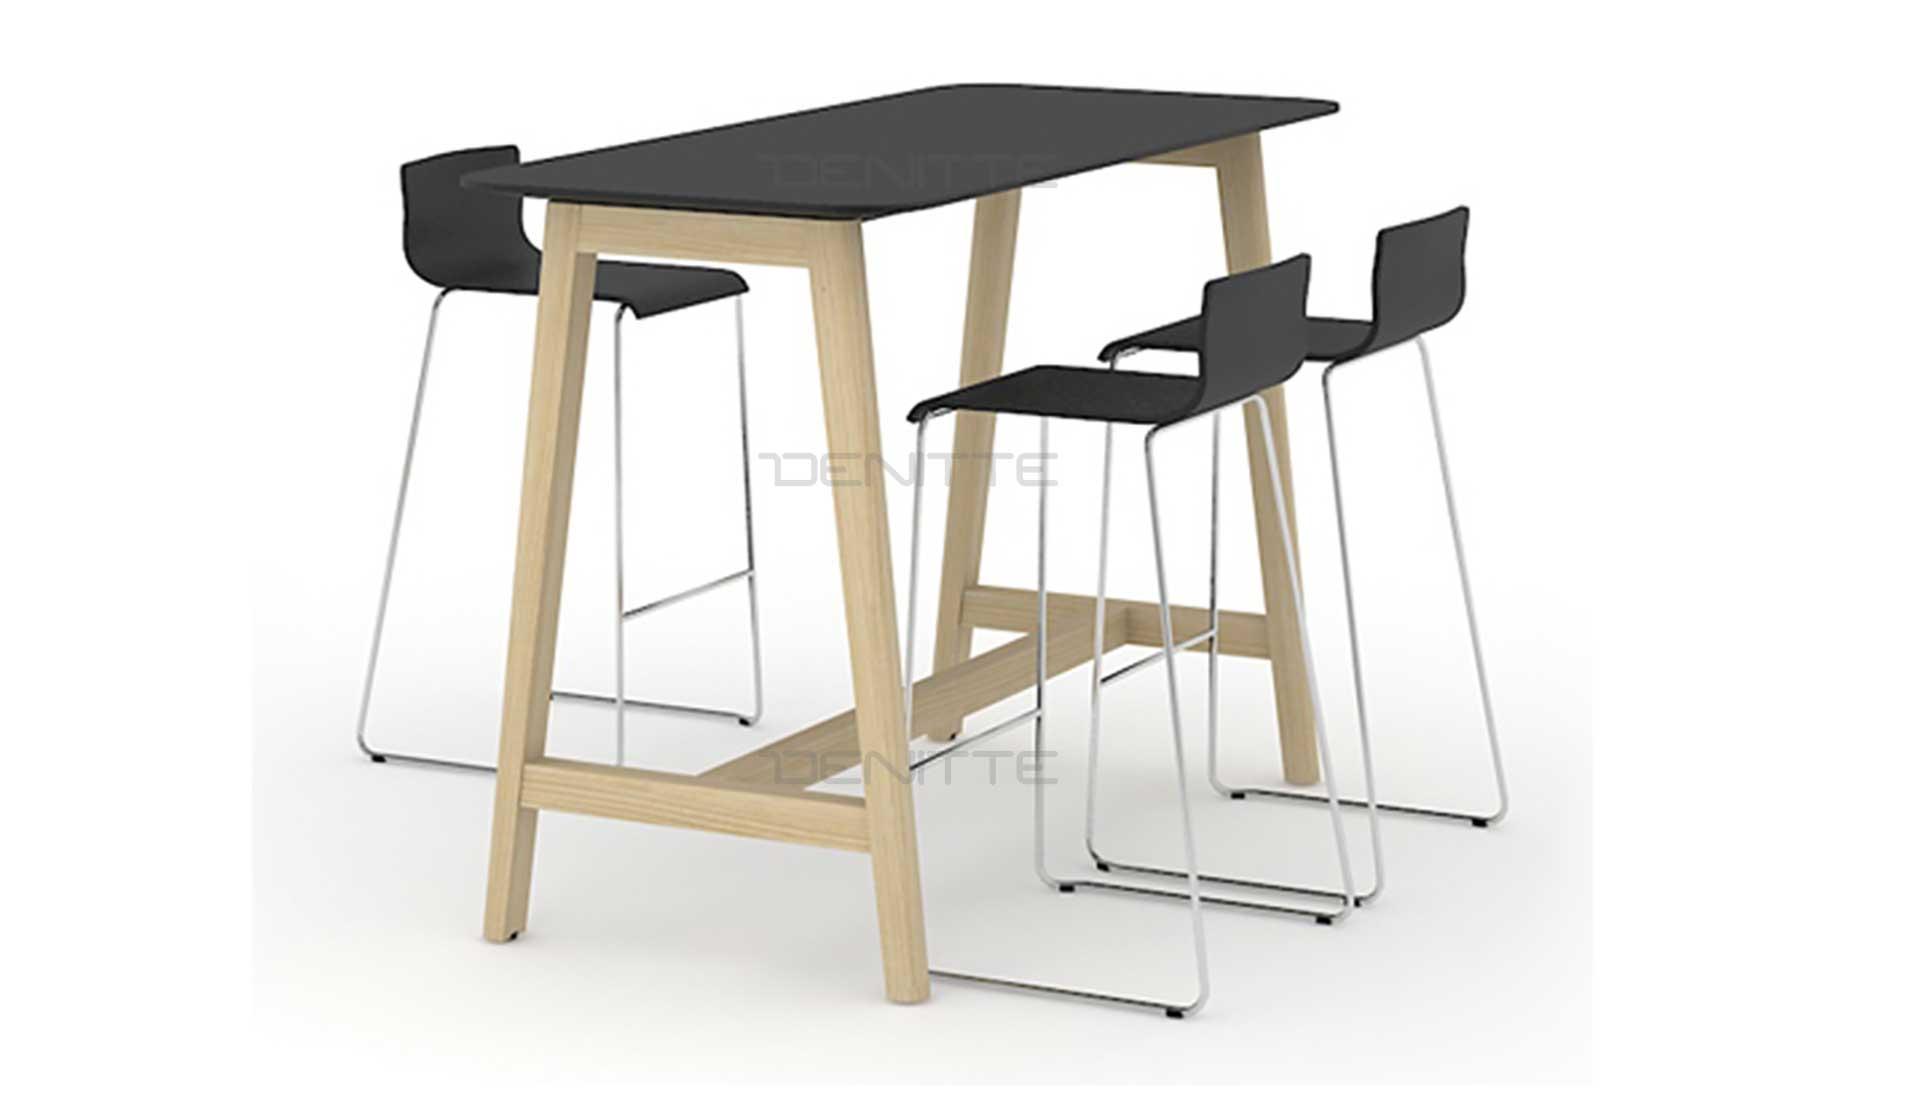 میز ایستاده woote